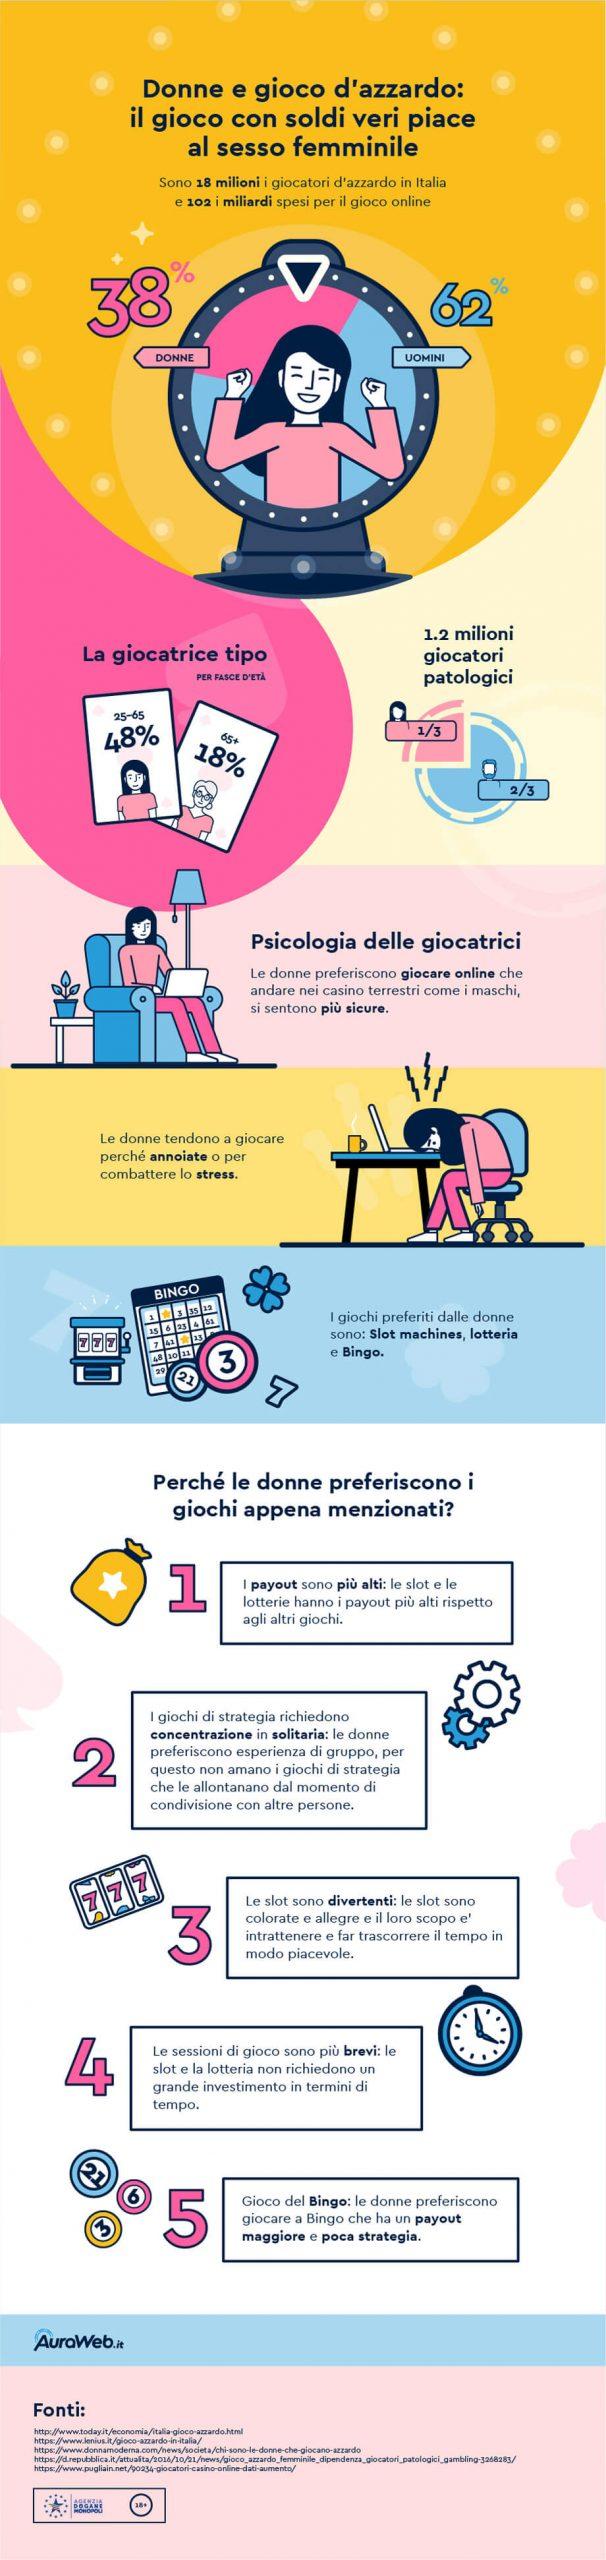 infografica-donne-gioco-azzardo